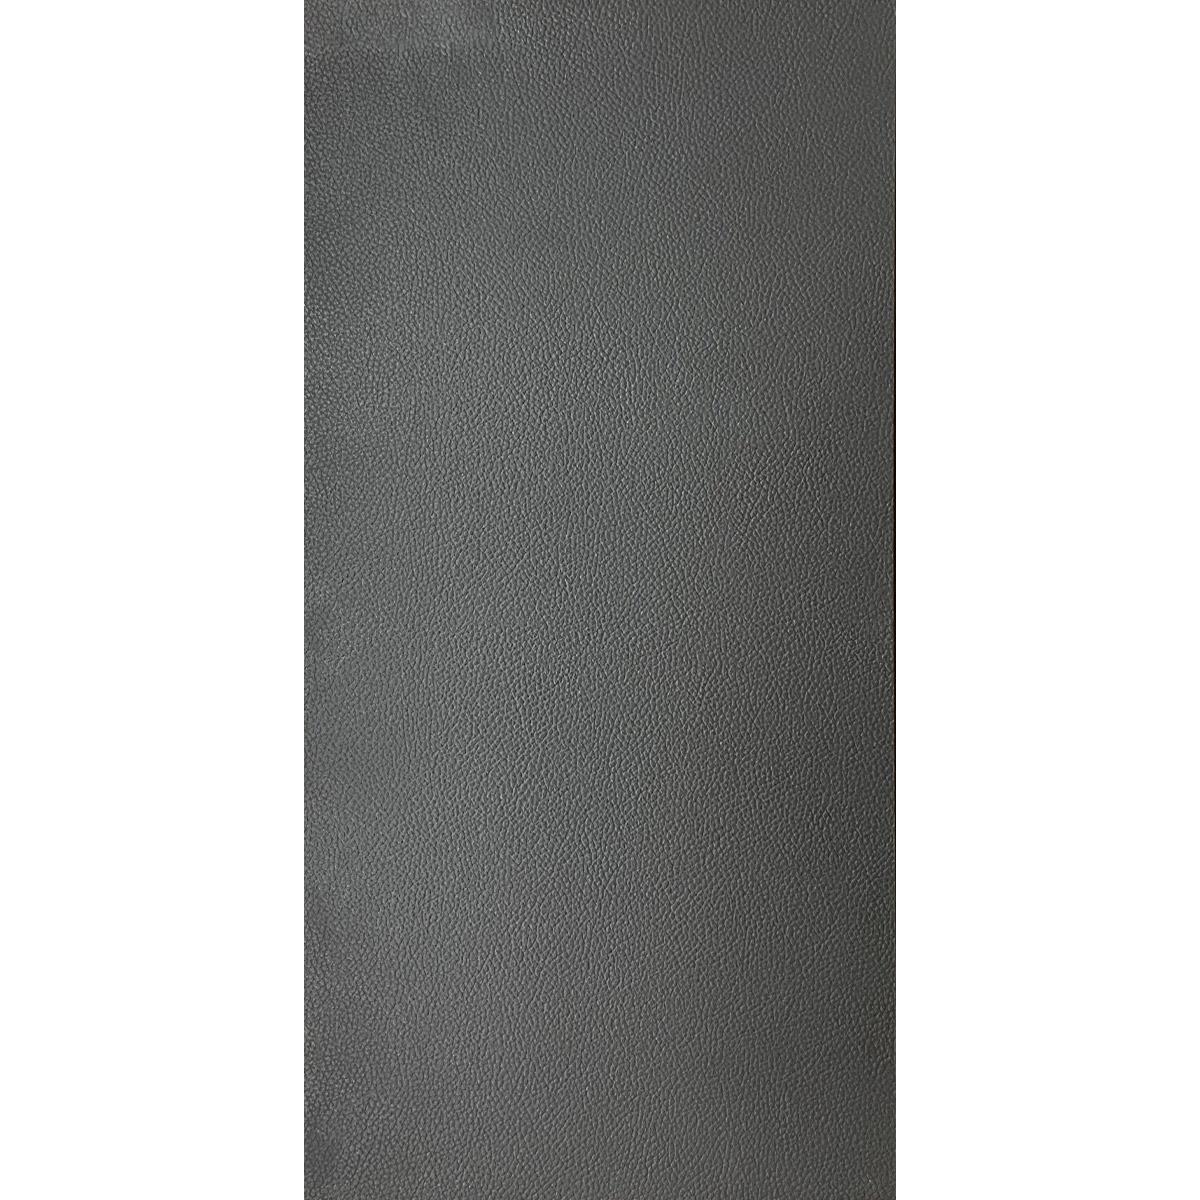 COSMOPOLITAN WOOD JETBLACK T11023